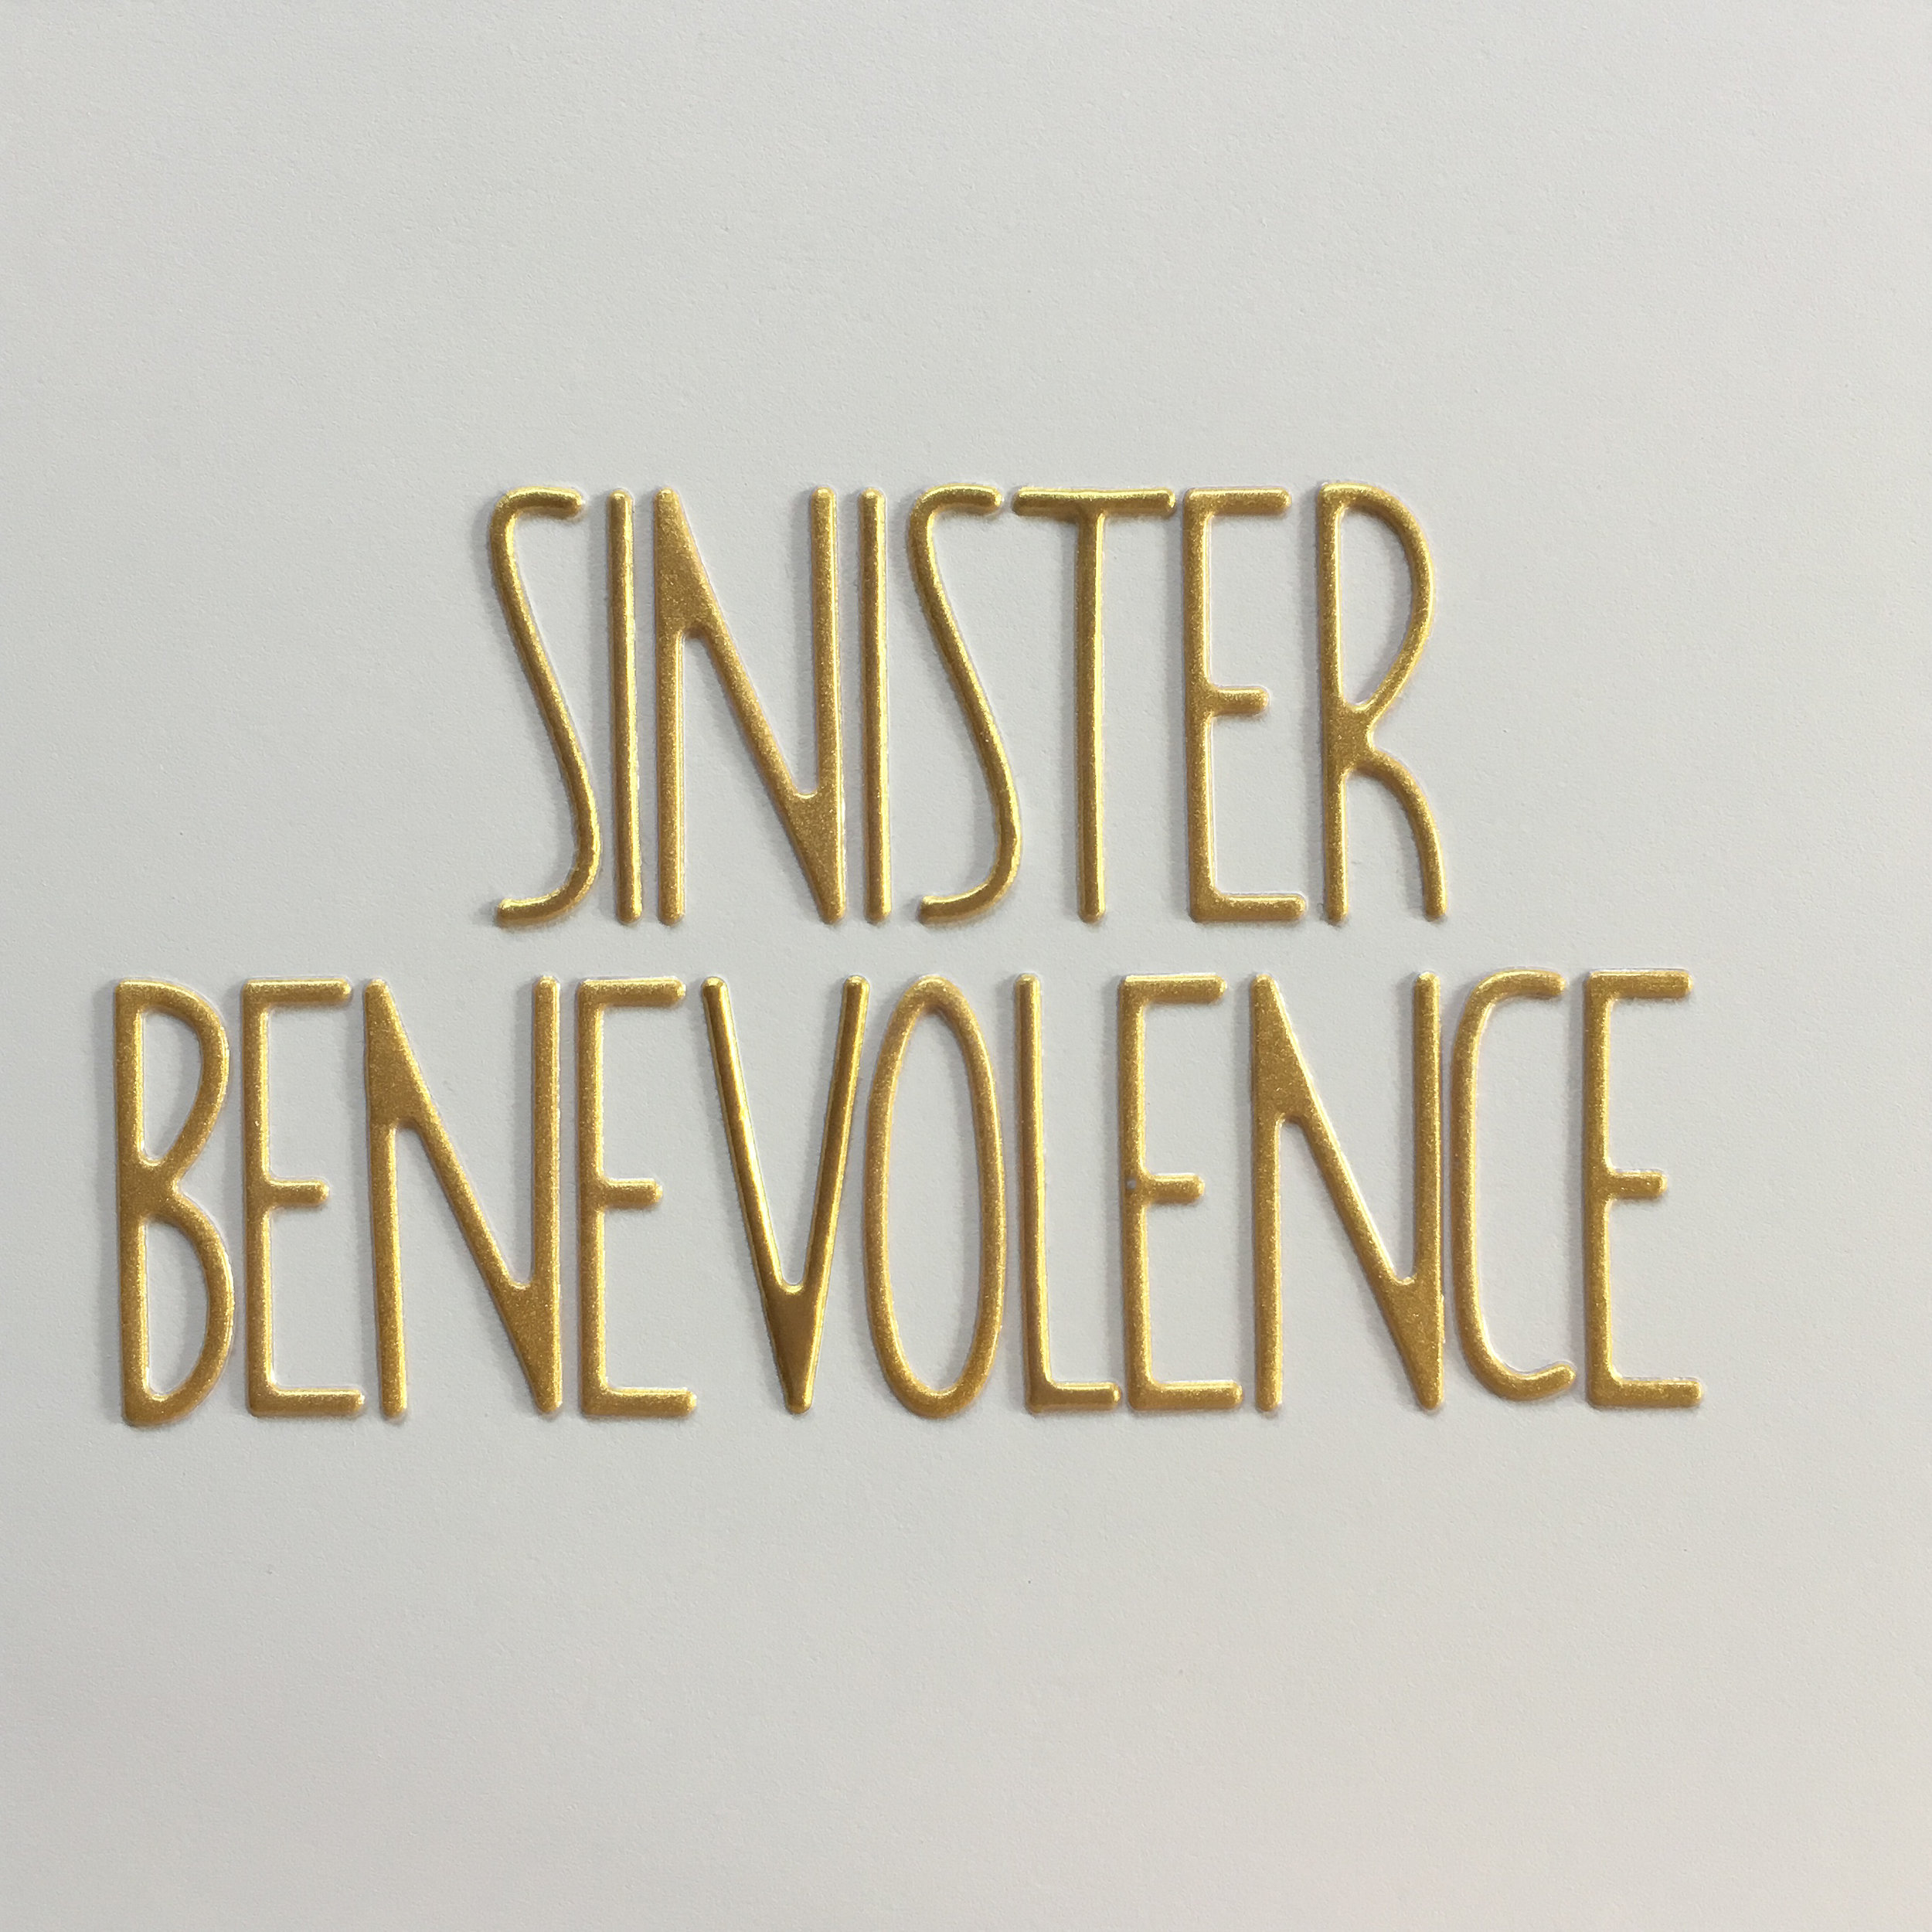 sinister benevolence.jpg